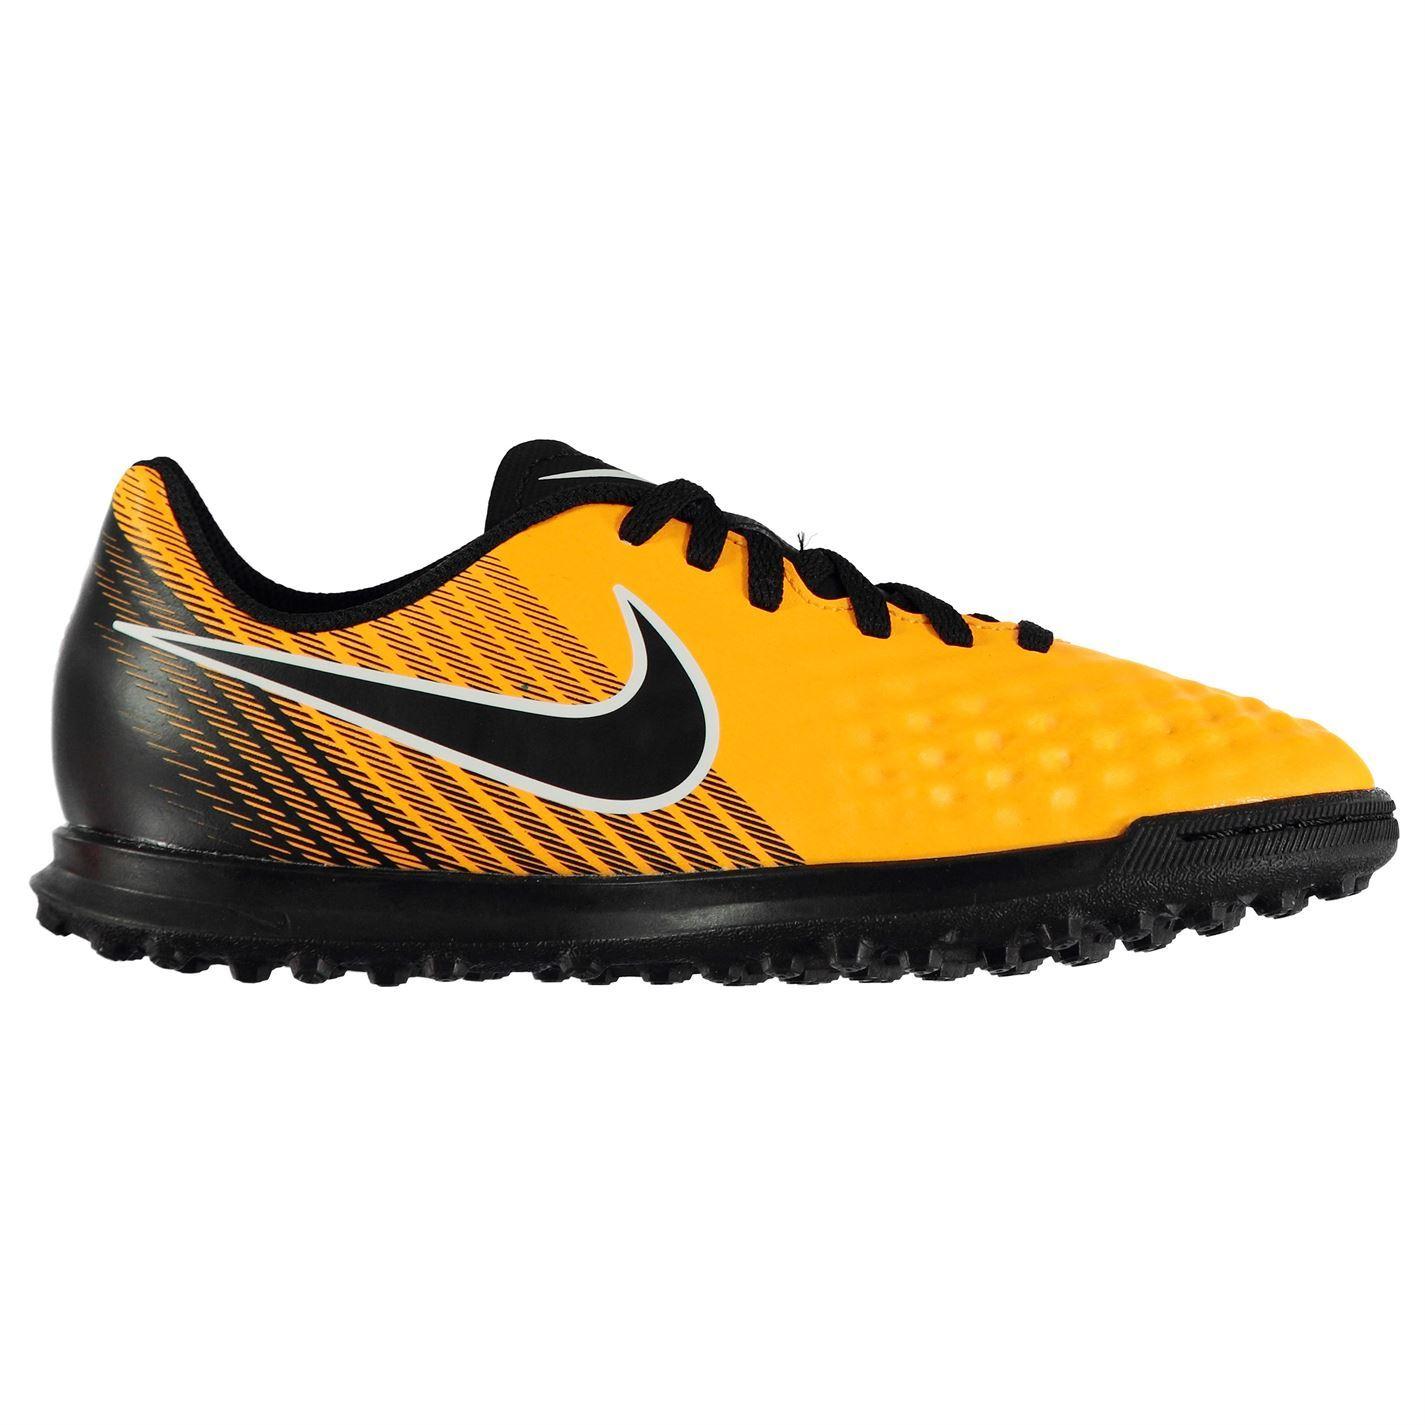 c83ad8eae001f ... Nike Magista Ola II Astro Turf Football Trainers Juniors Orange Soccer  Shoes ...